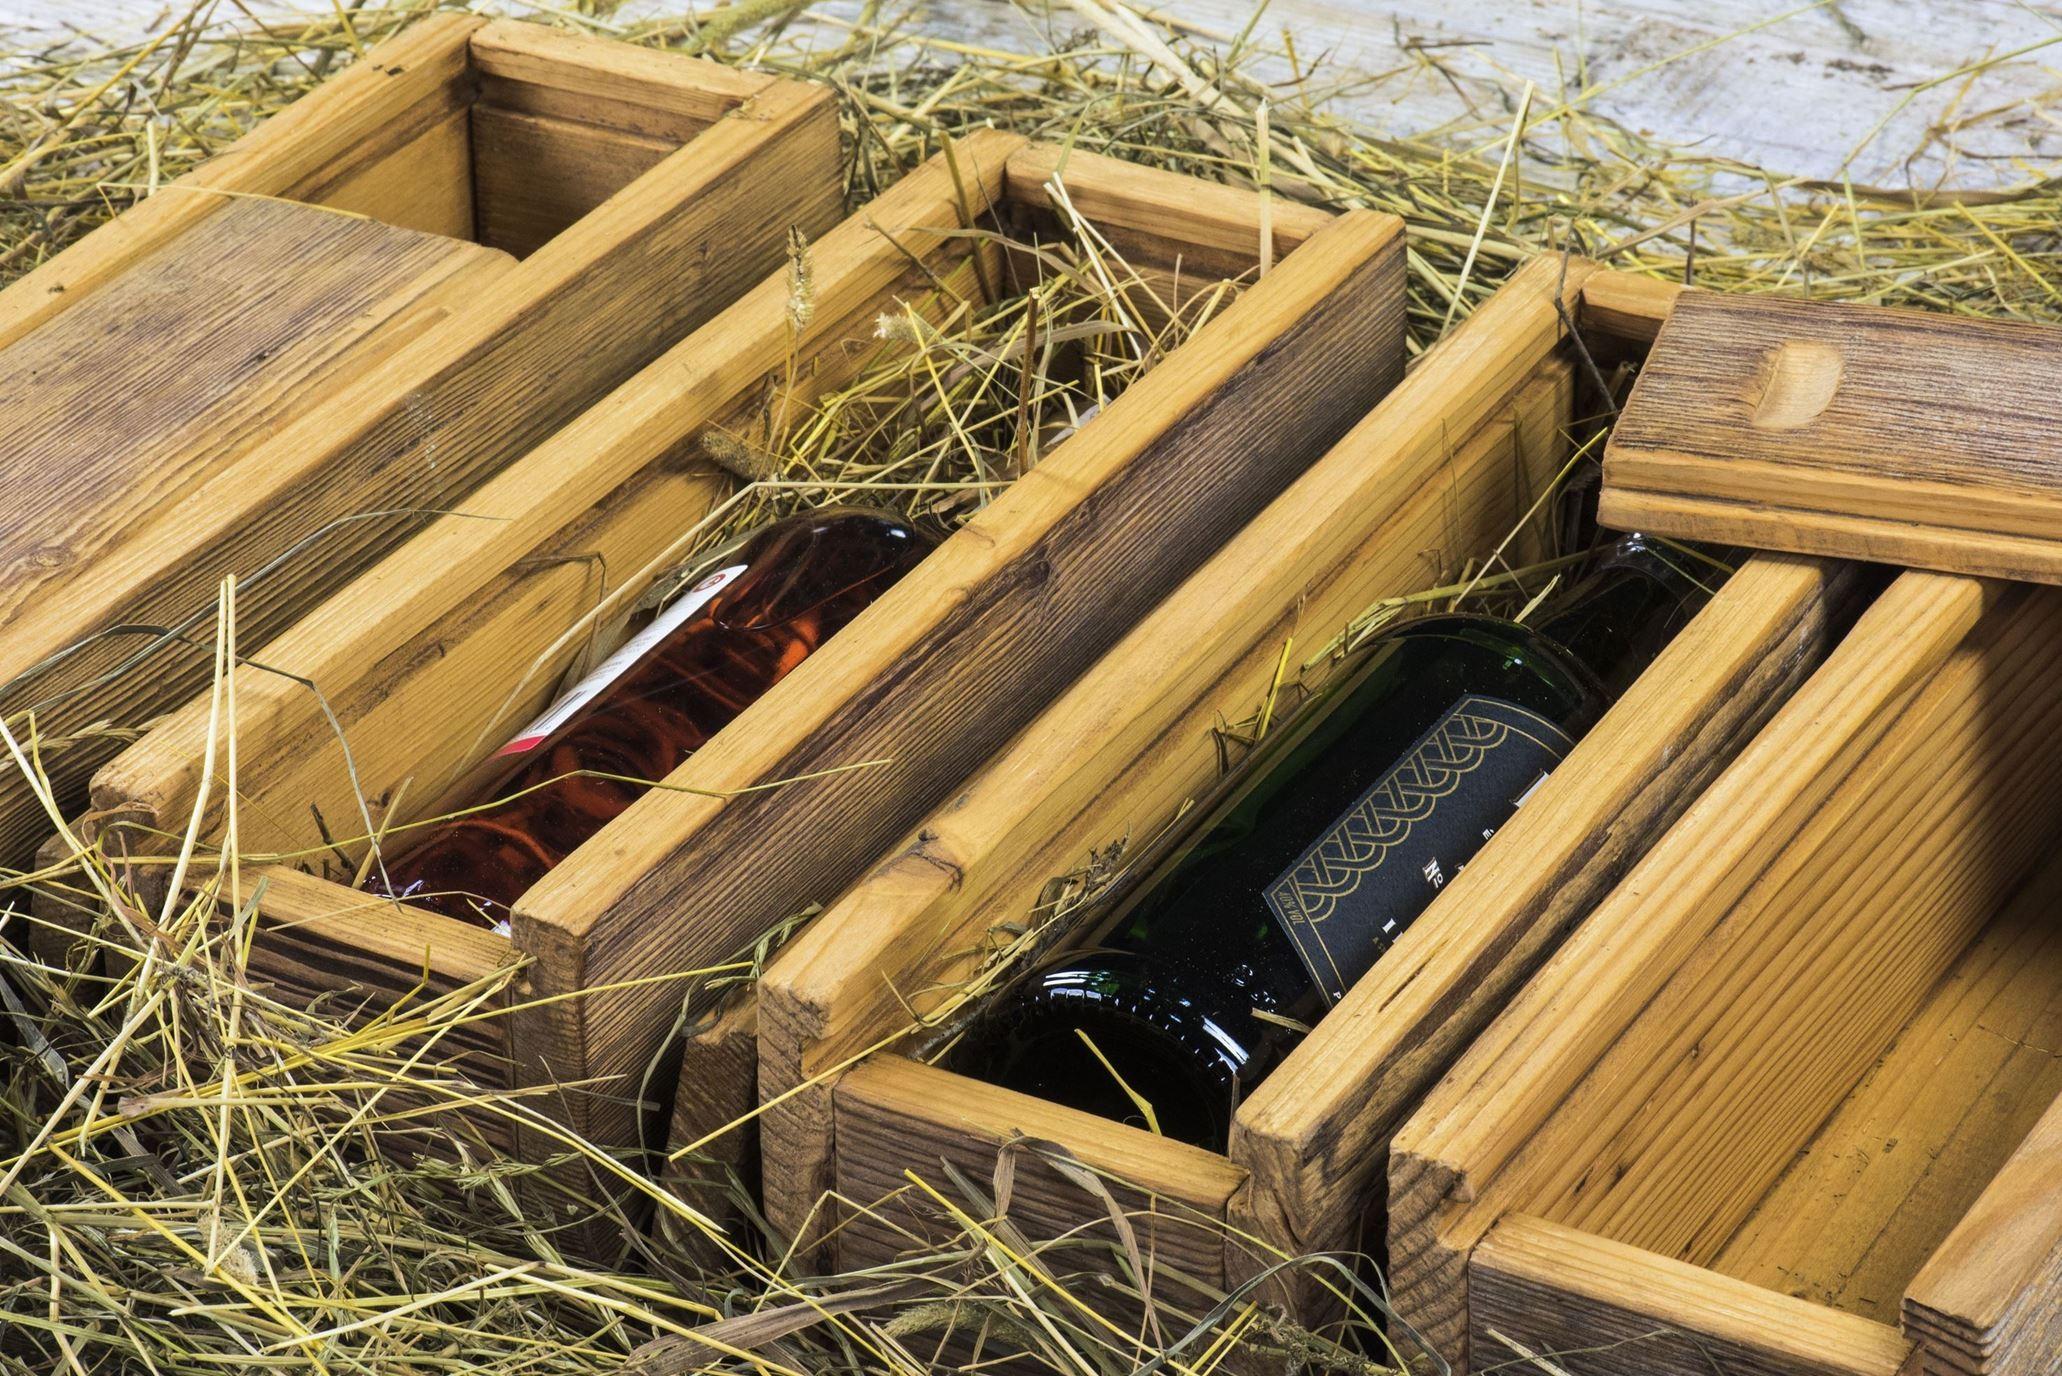 Skrzynka na wino - stare drewno